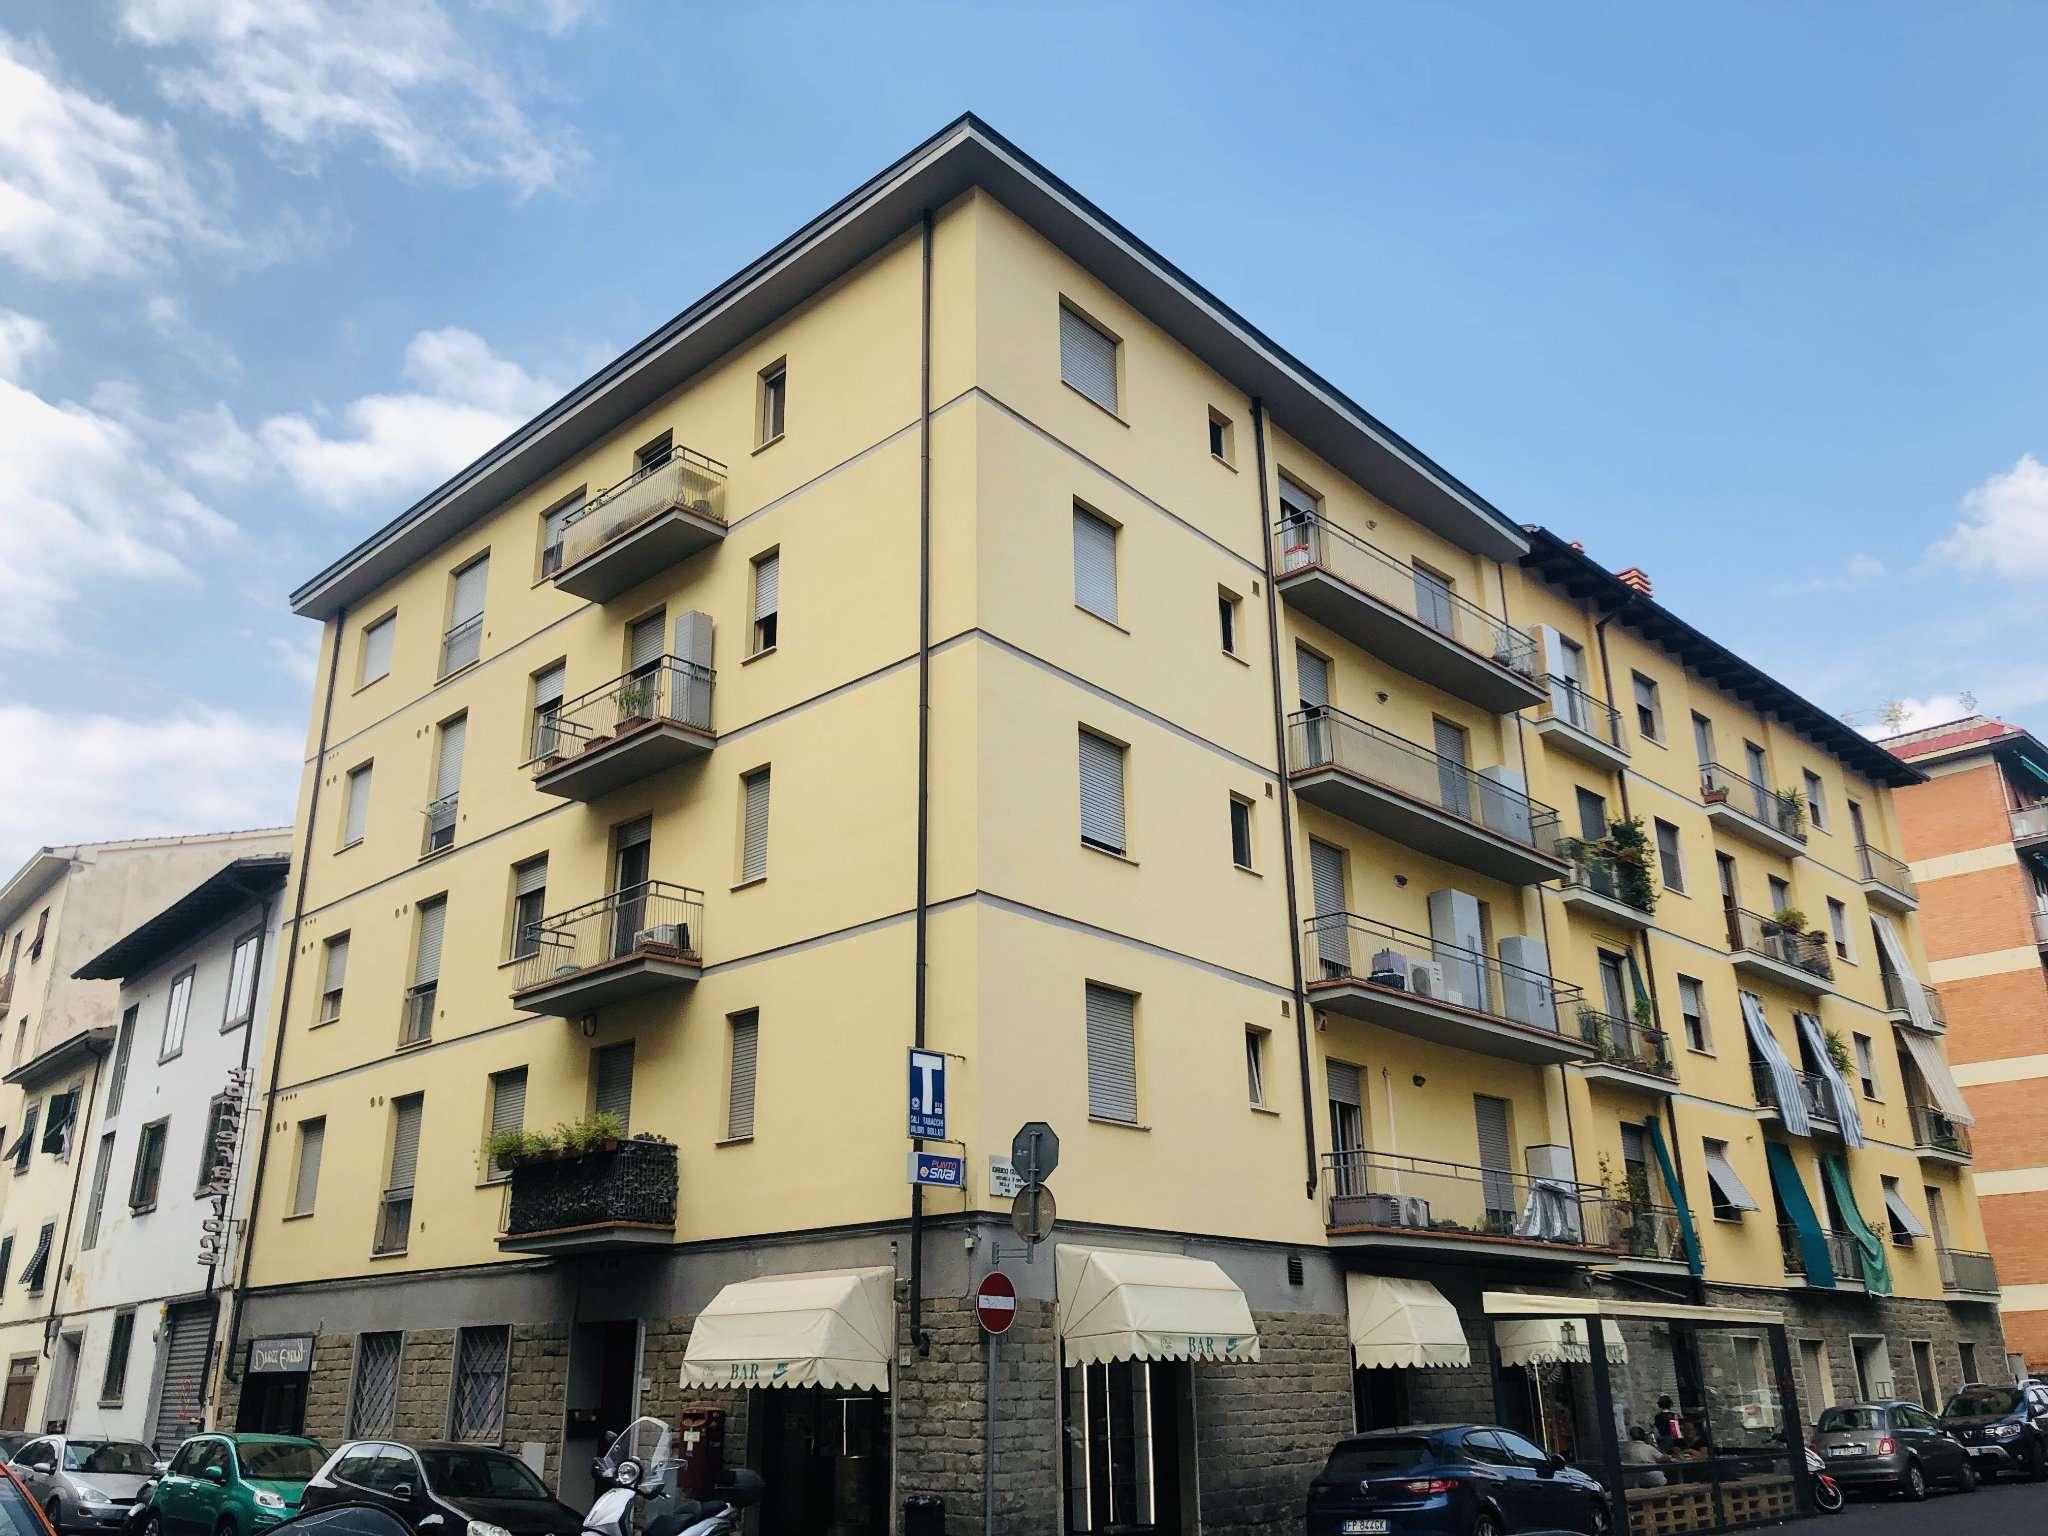 Appartamento in Vendita a Firenze Periferia Ovest: 3 locali, 50 mq